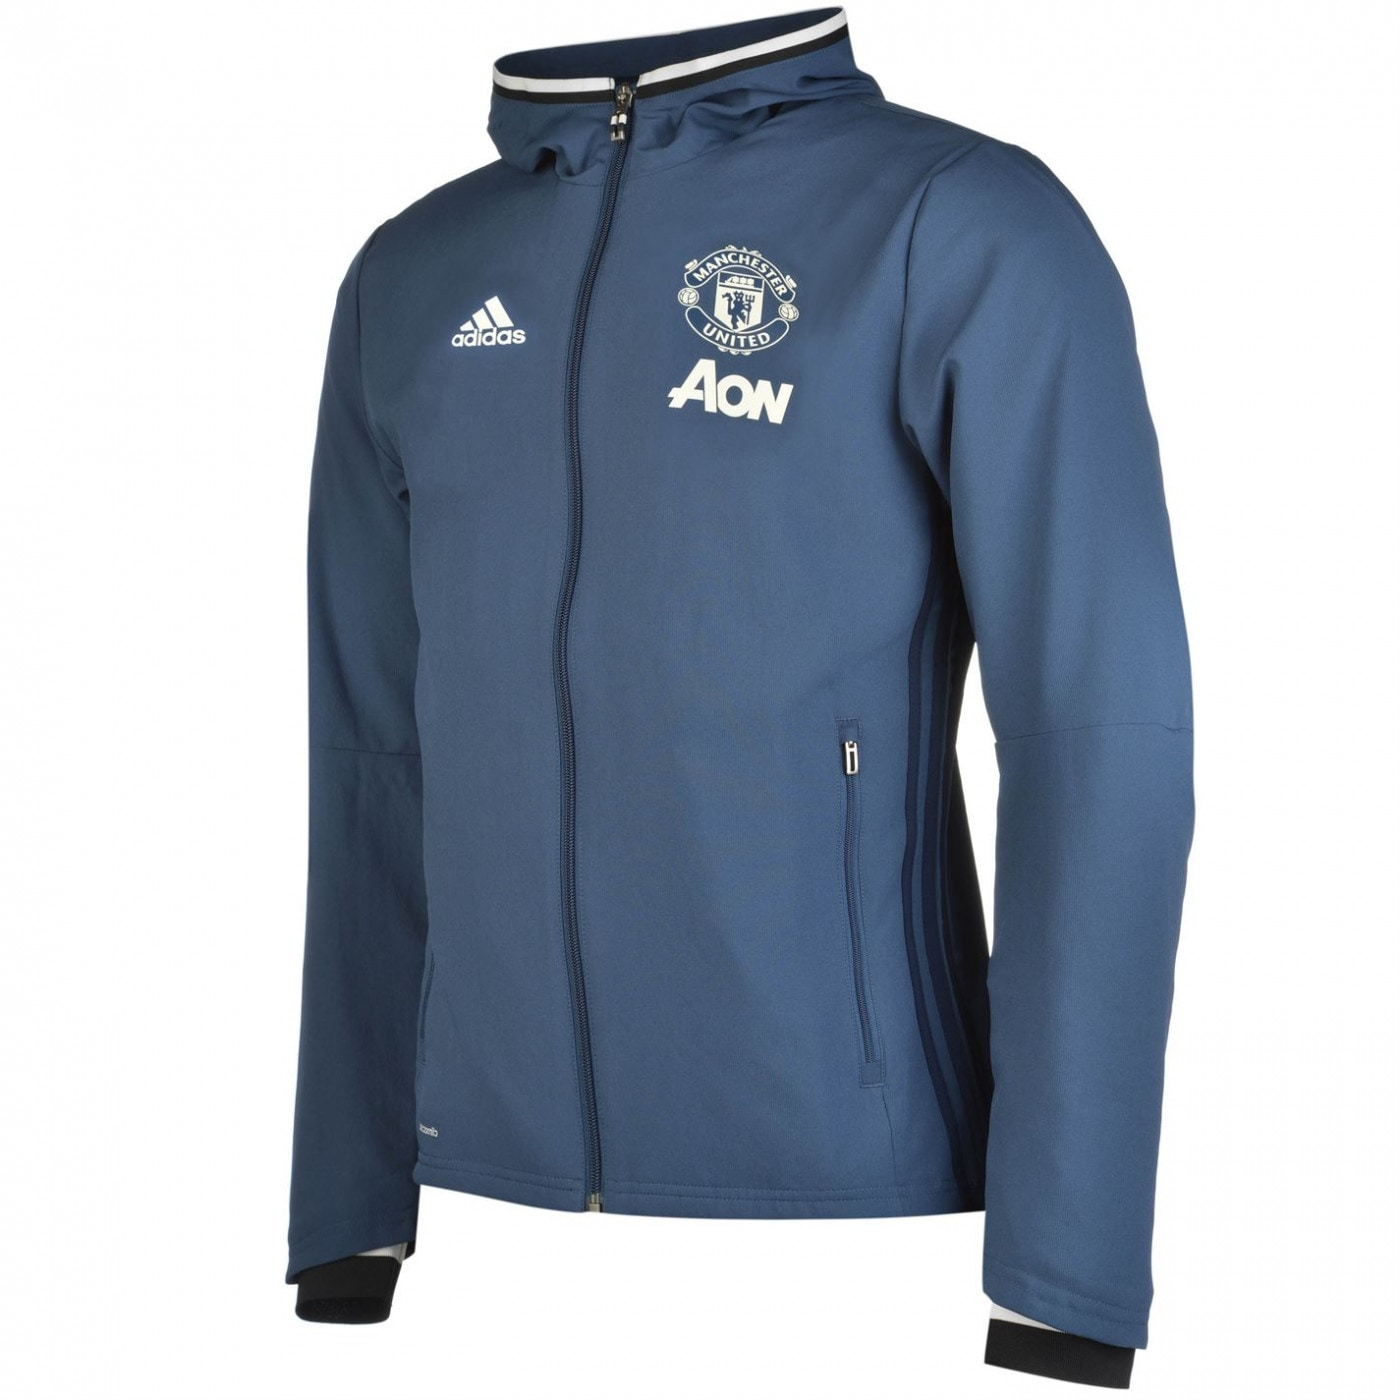 18632c5a5e adidas Manchester United Pre Match Jacket Mens - FACTCOOL